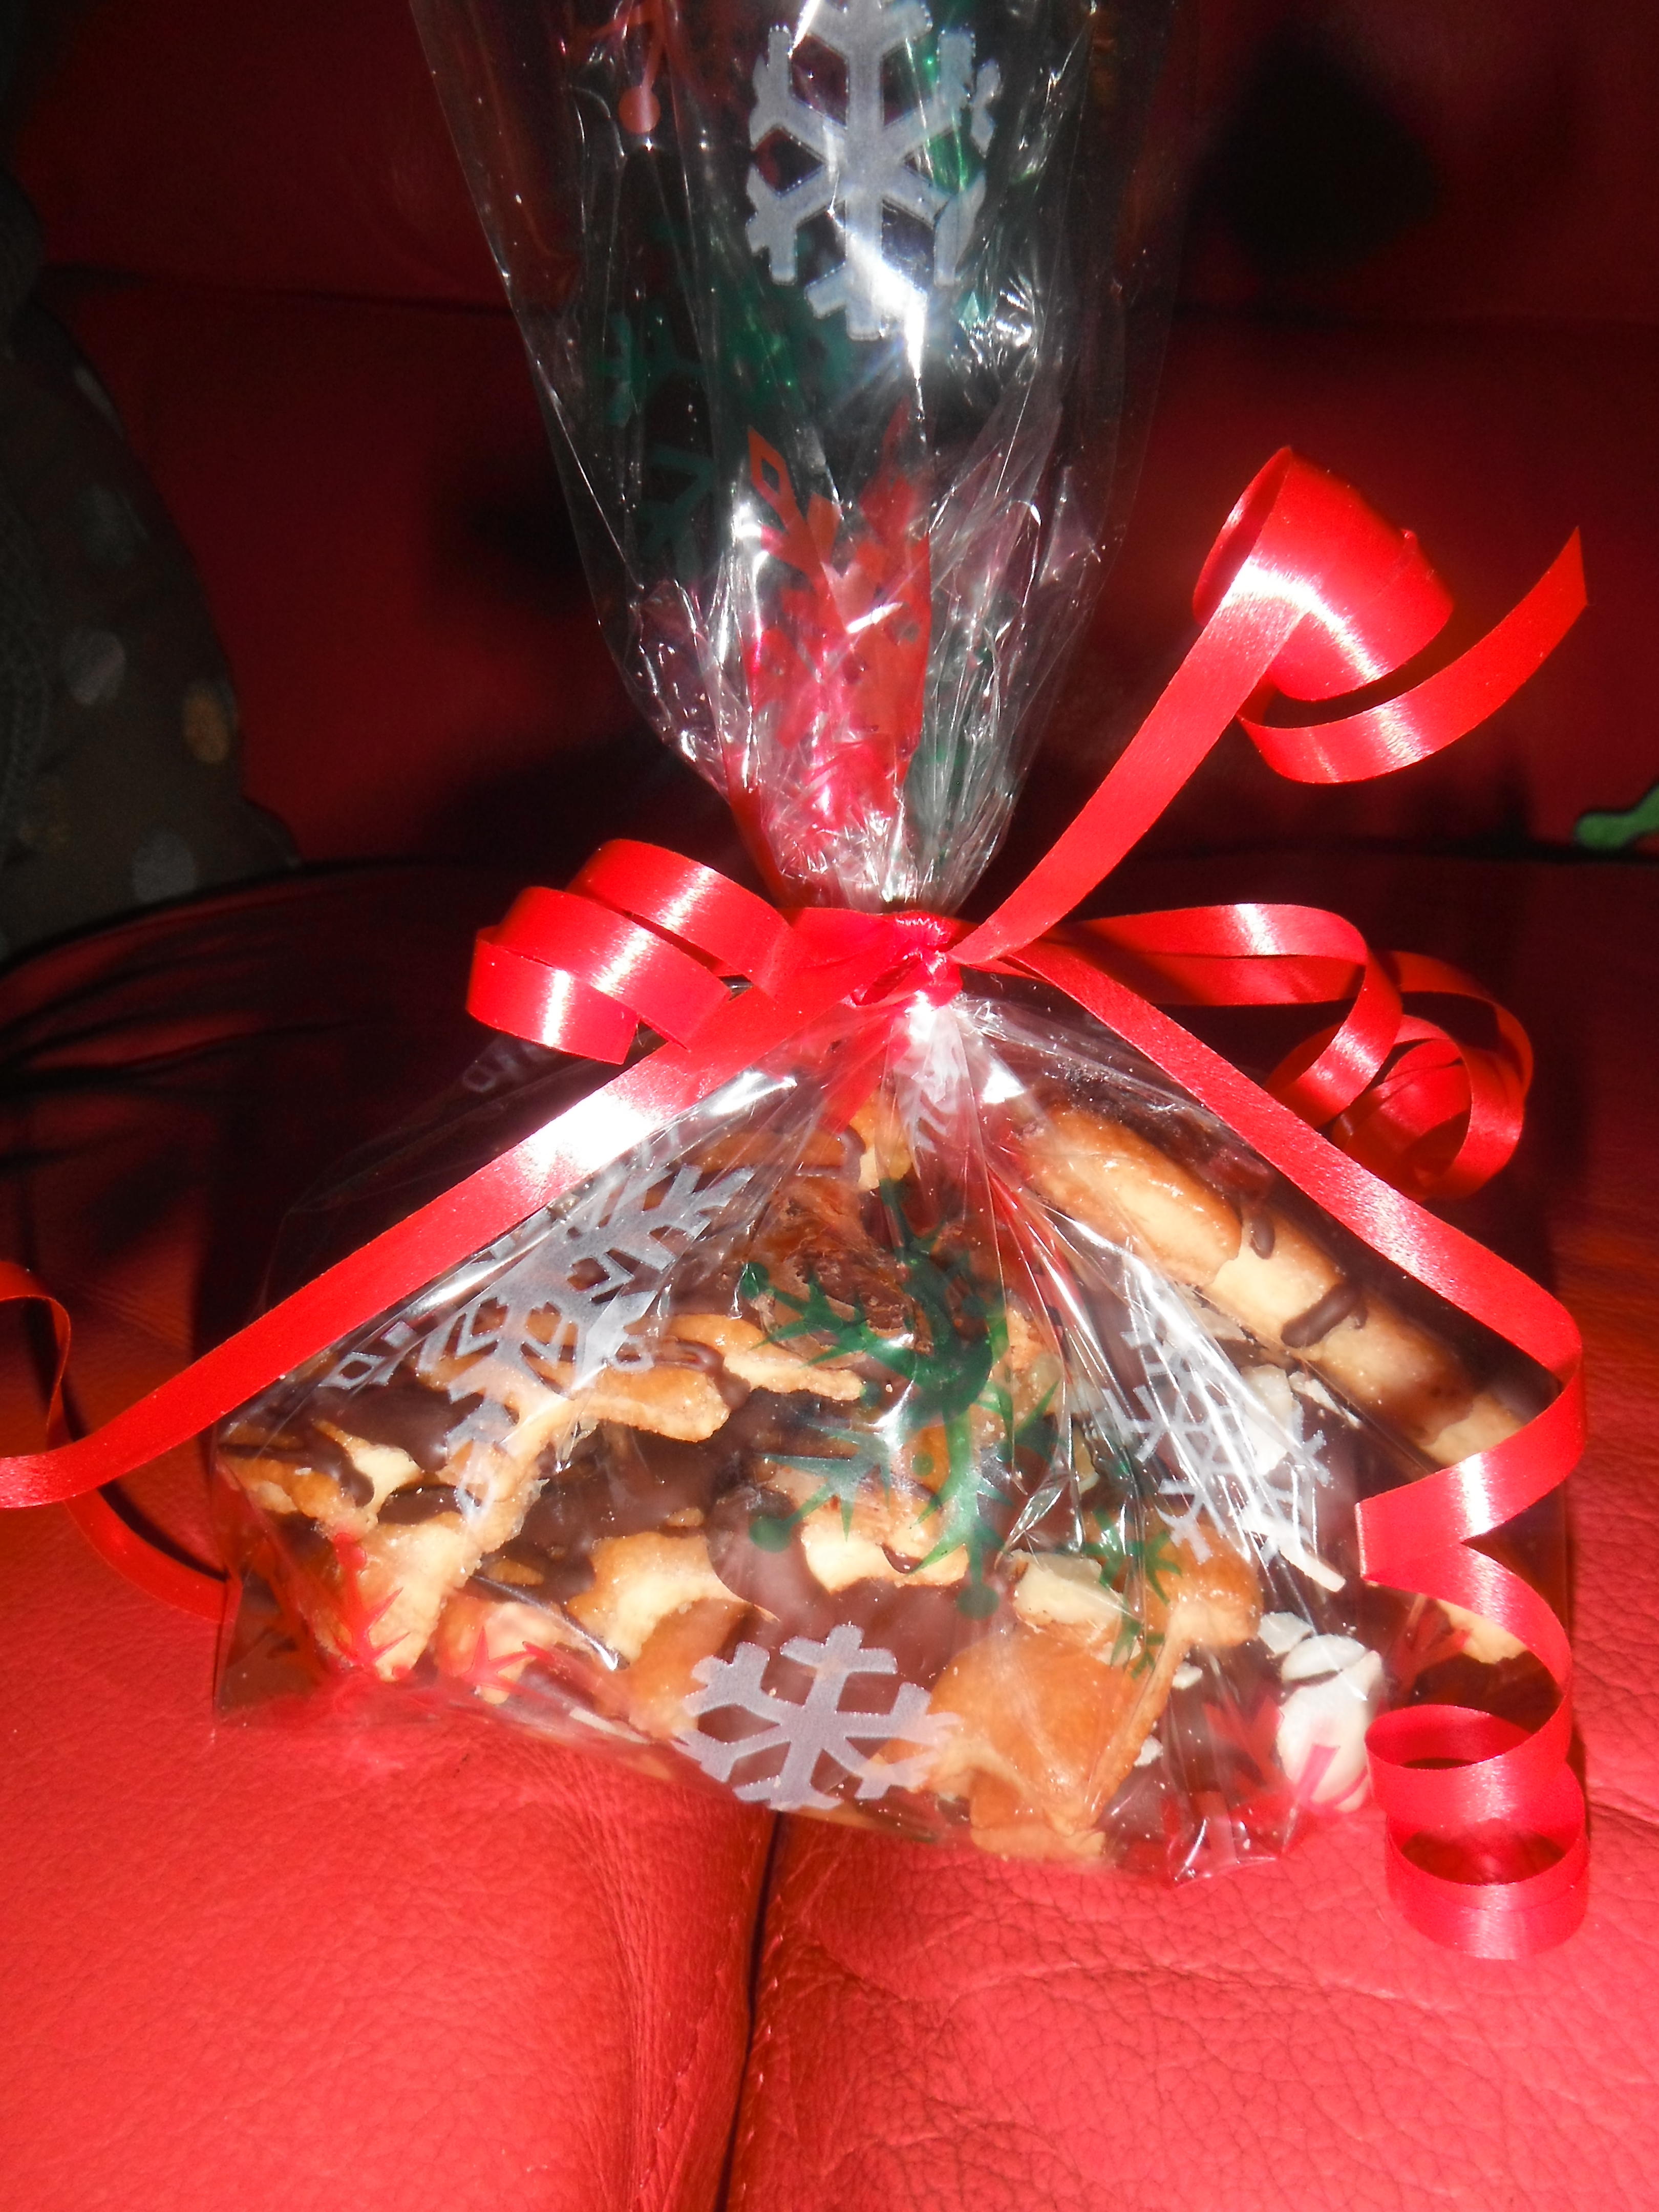 Chocolate Christmas Tree Decorations Asda : Christmas tree biscuit decorating thanks to asda and